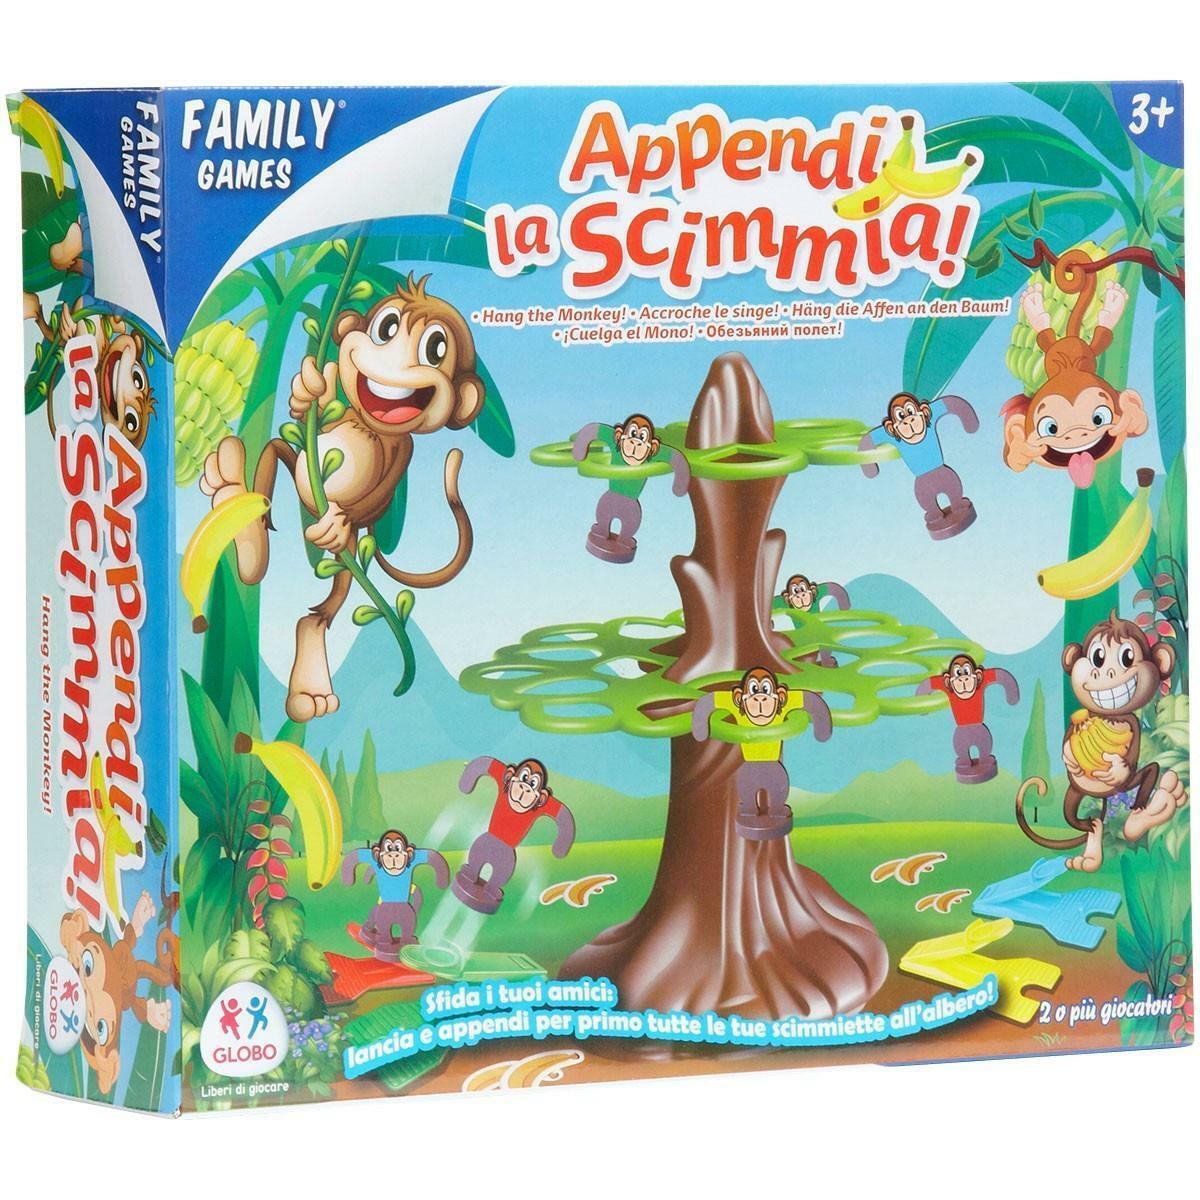 globo globo family games - appendi la scimmia